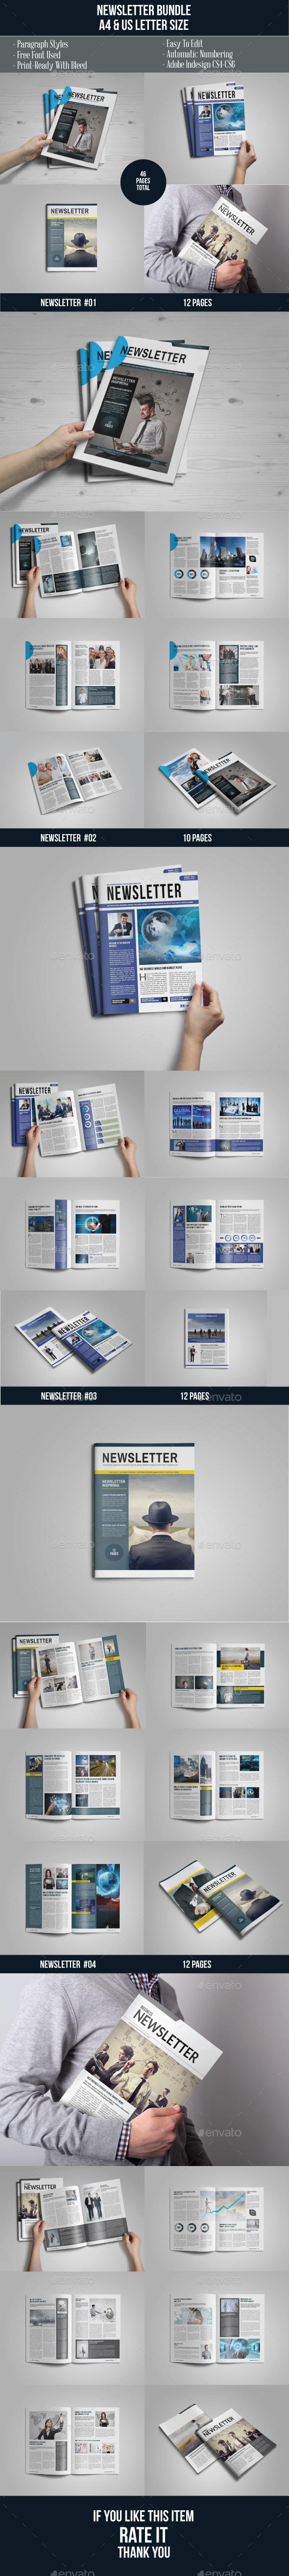 Multipurpose Newsletter Bundle Vol. 1 - Newsletters Print Templates